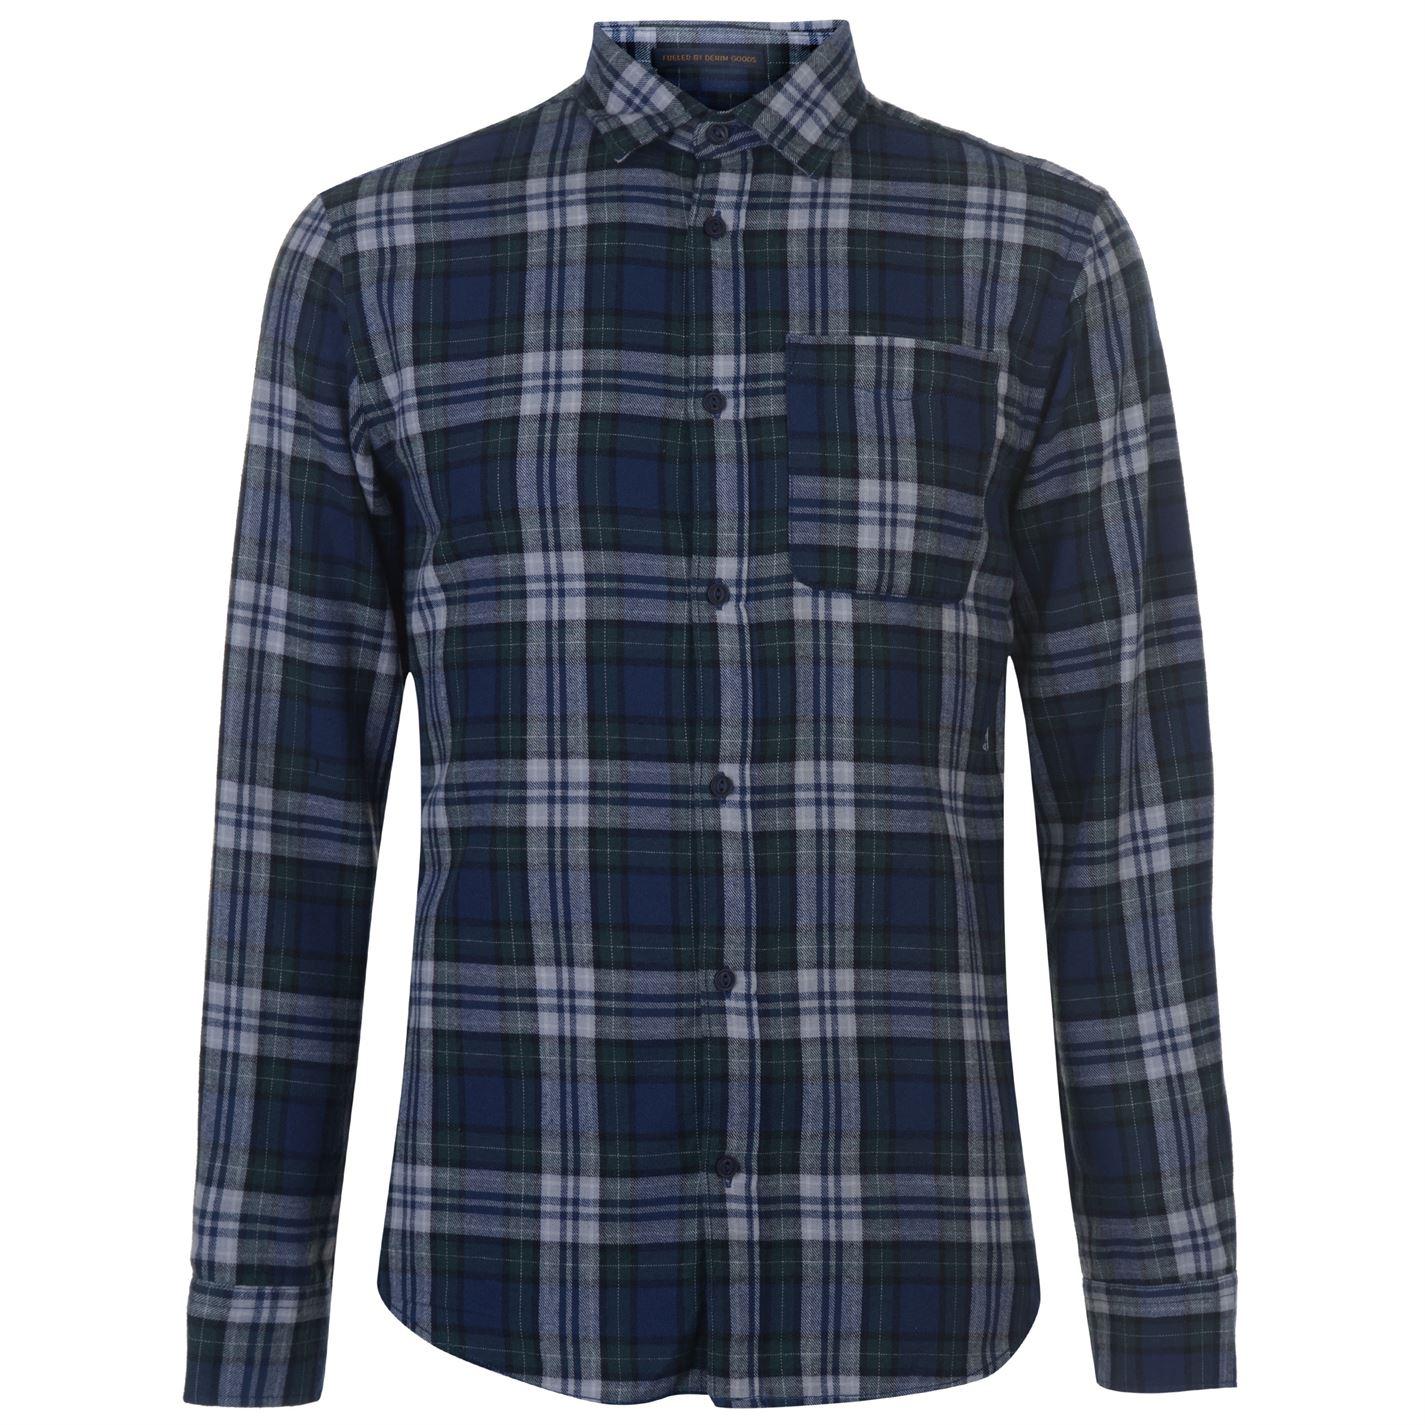 Jack and Jones Originals Steven Long Sleeve Shirt